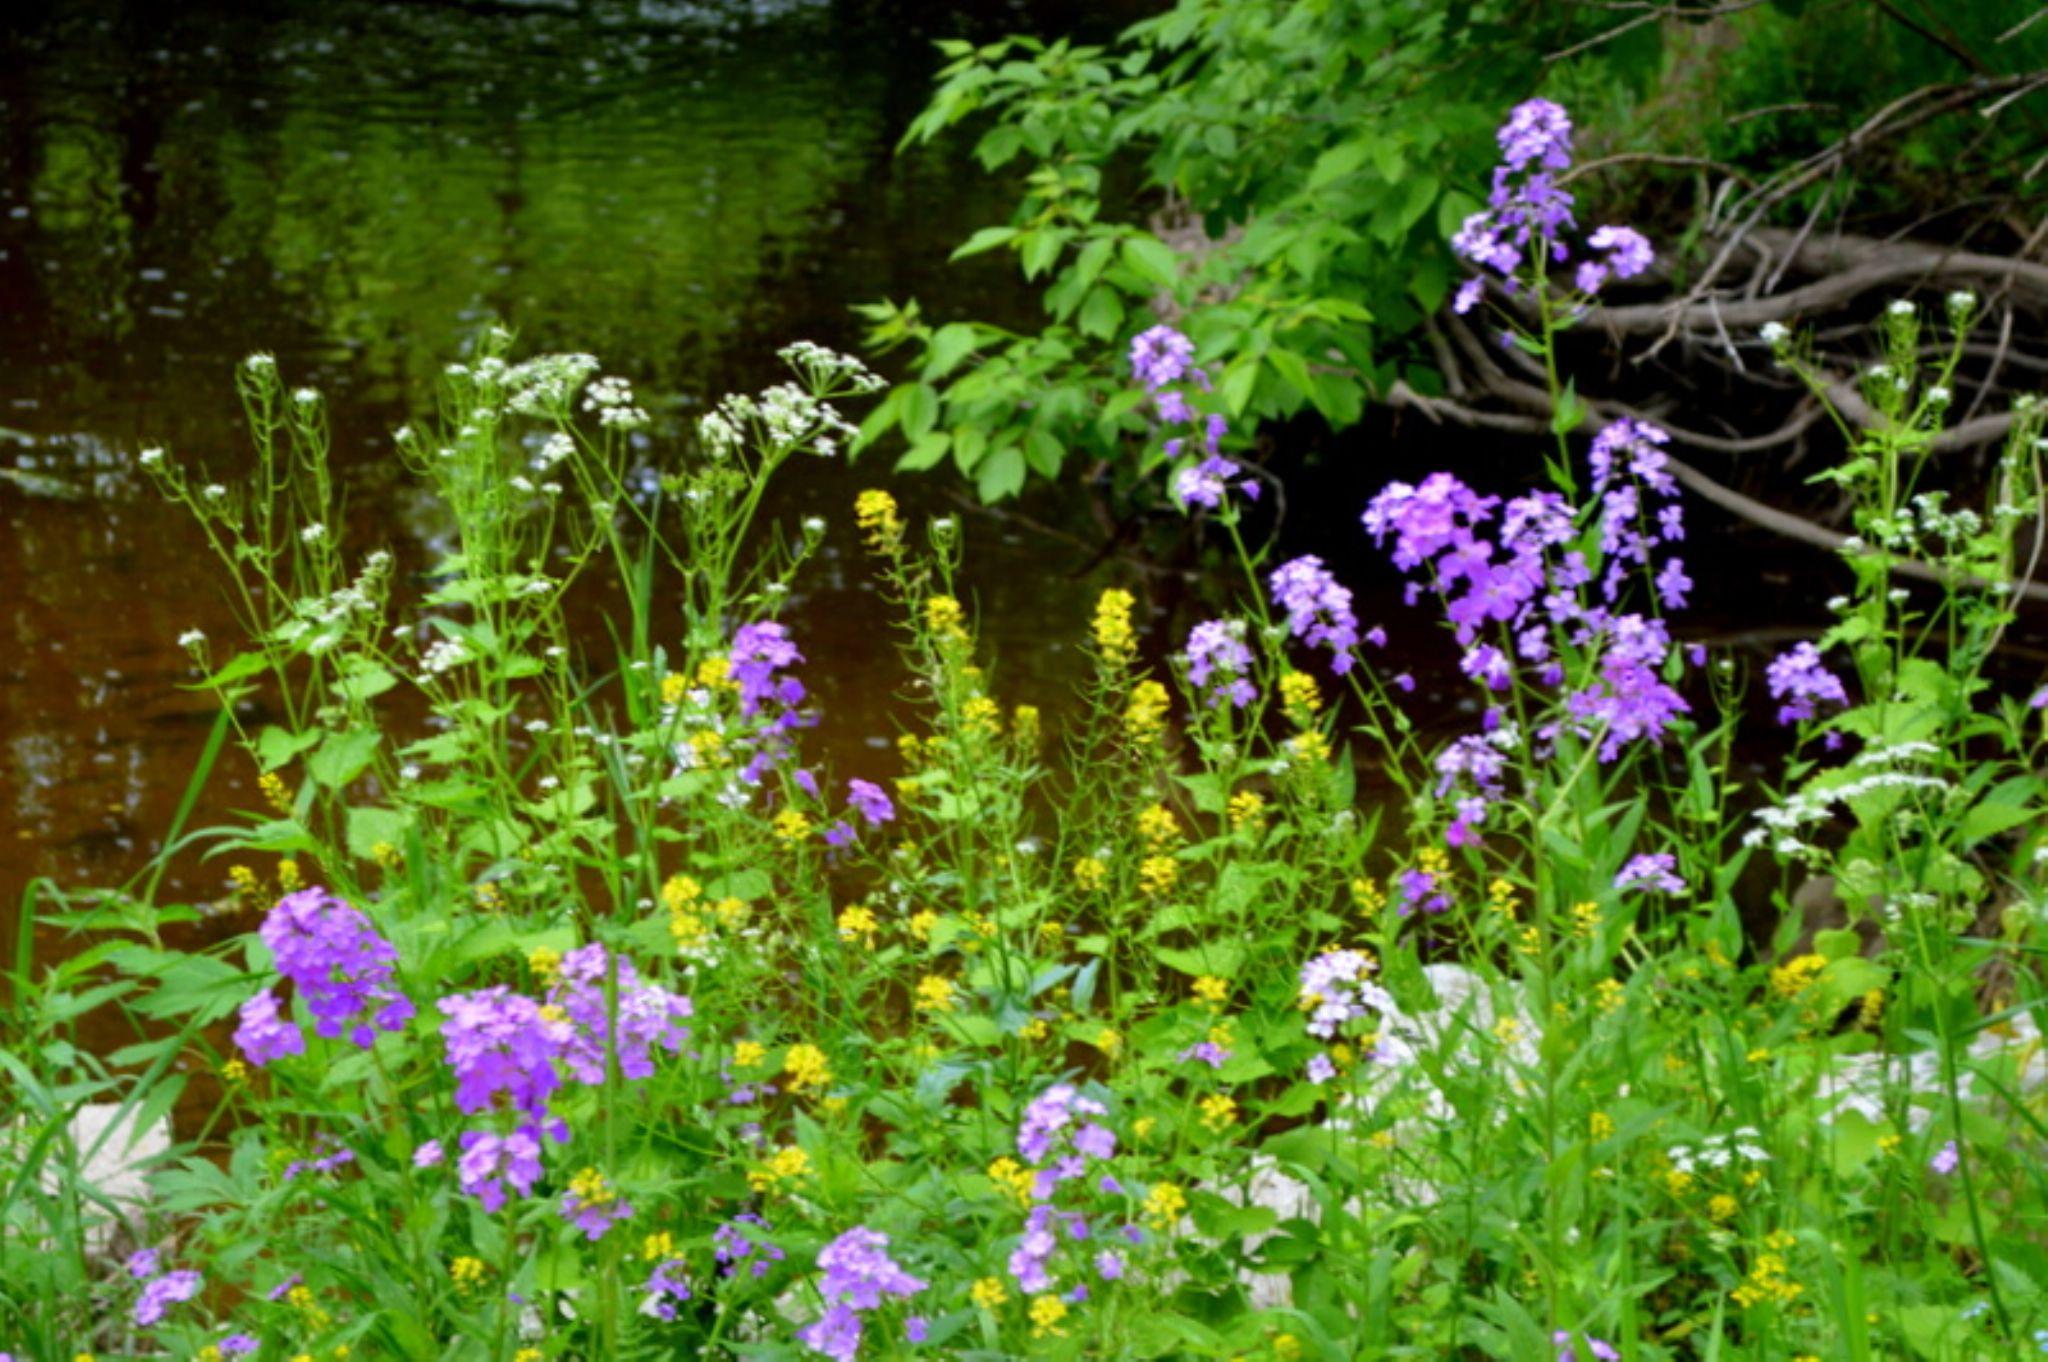 wild flowers by Karen Mayer